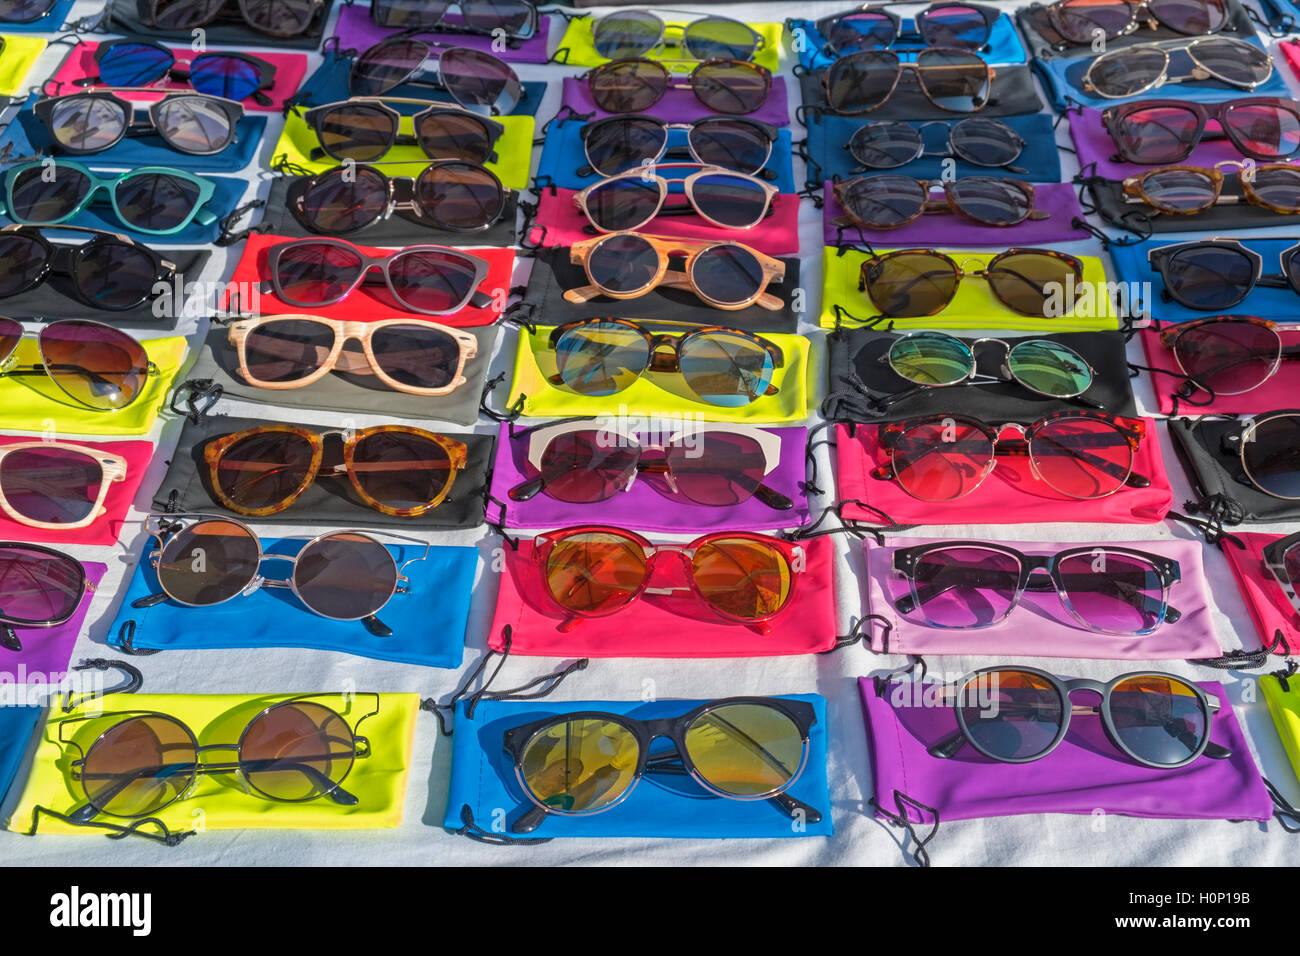 Colourful sunglasses Feira da Ladra Thieves' Market Campo de Santa Clara Lisbon Portugal - Stock Image